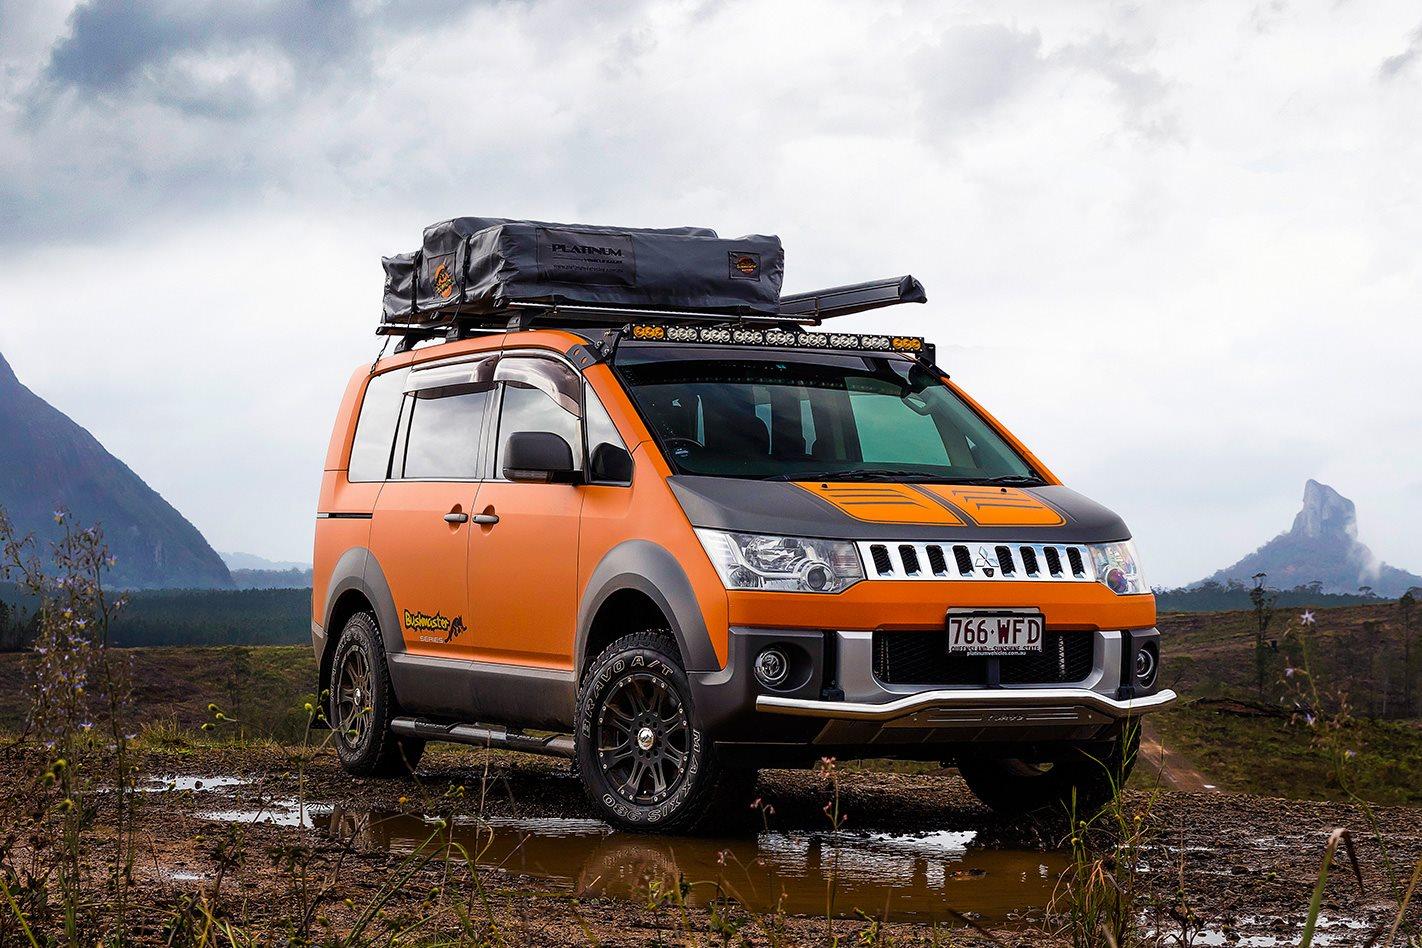 2018 Honda Odyssey Australia >> 2018 Mitsubishi Van - New Car Release Date and Review 2018 | Amanda Felicia